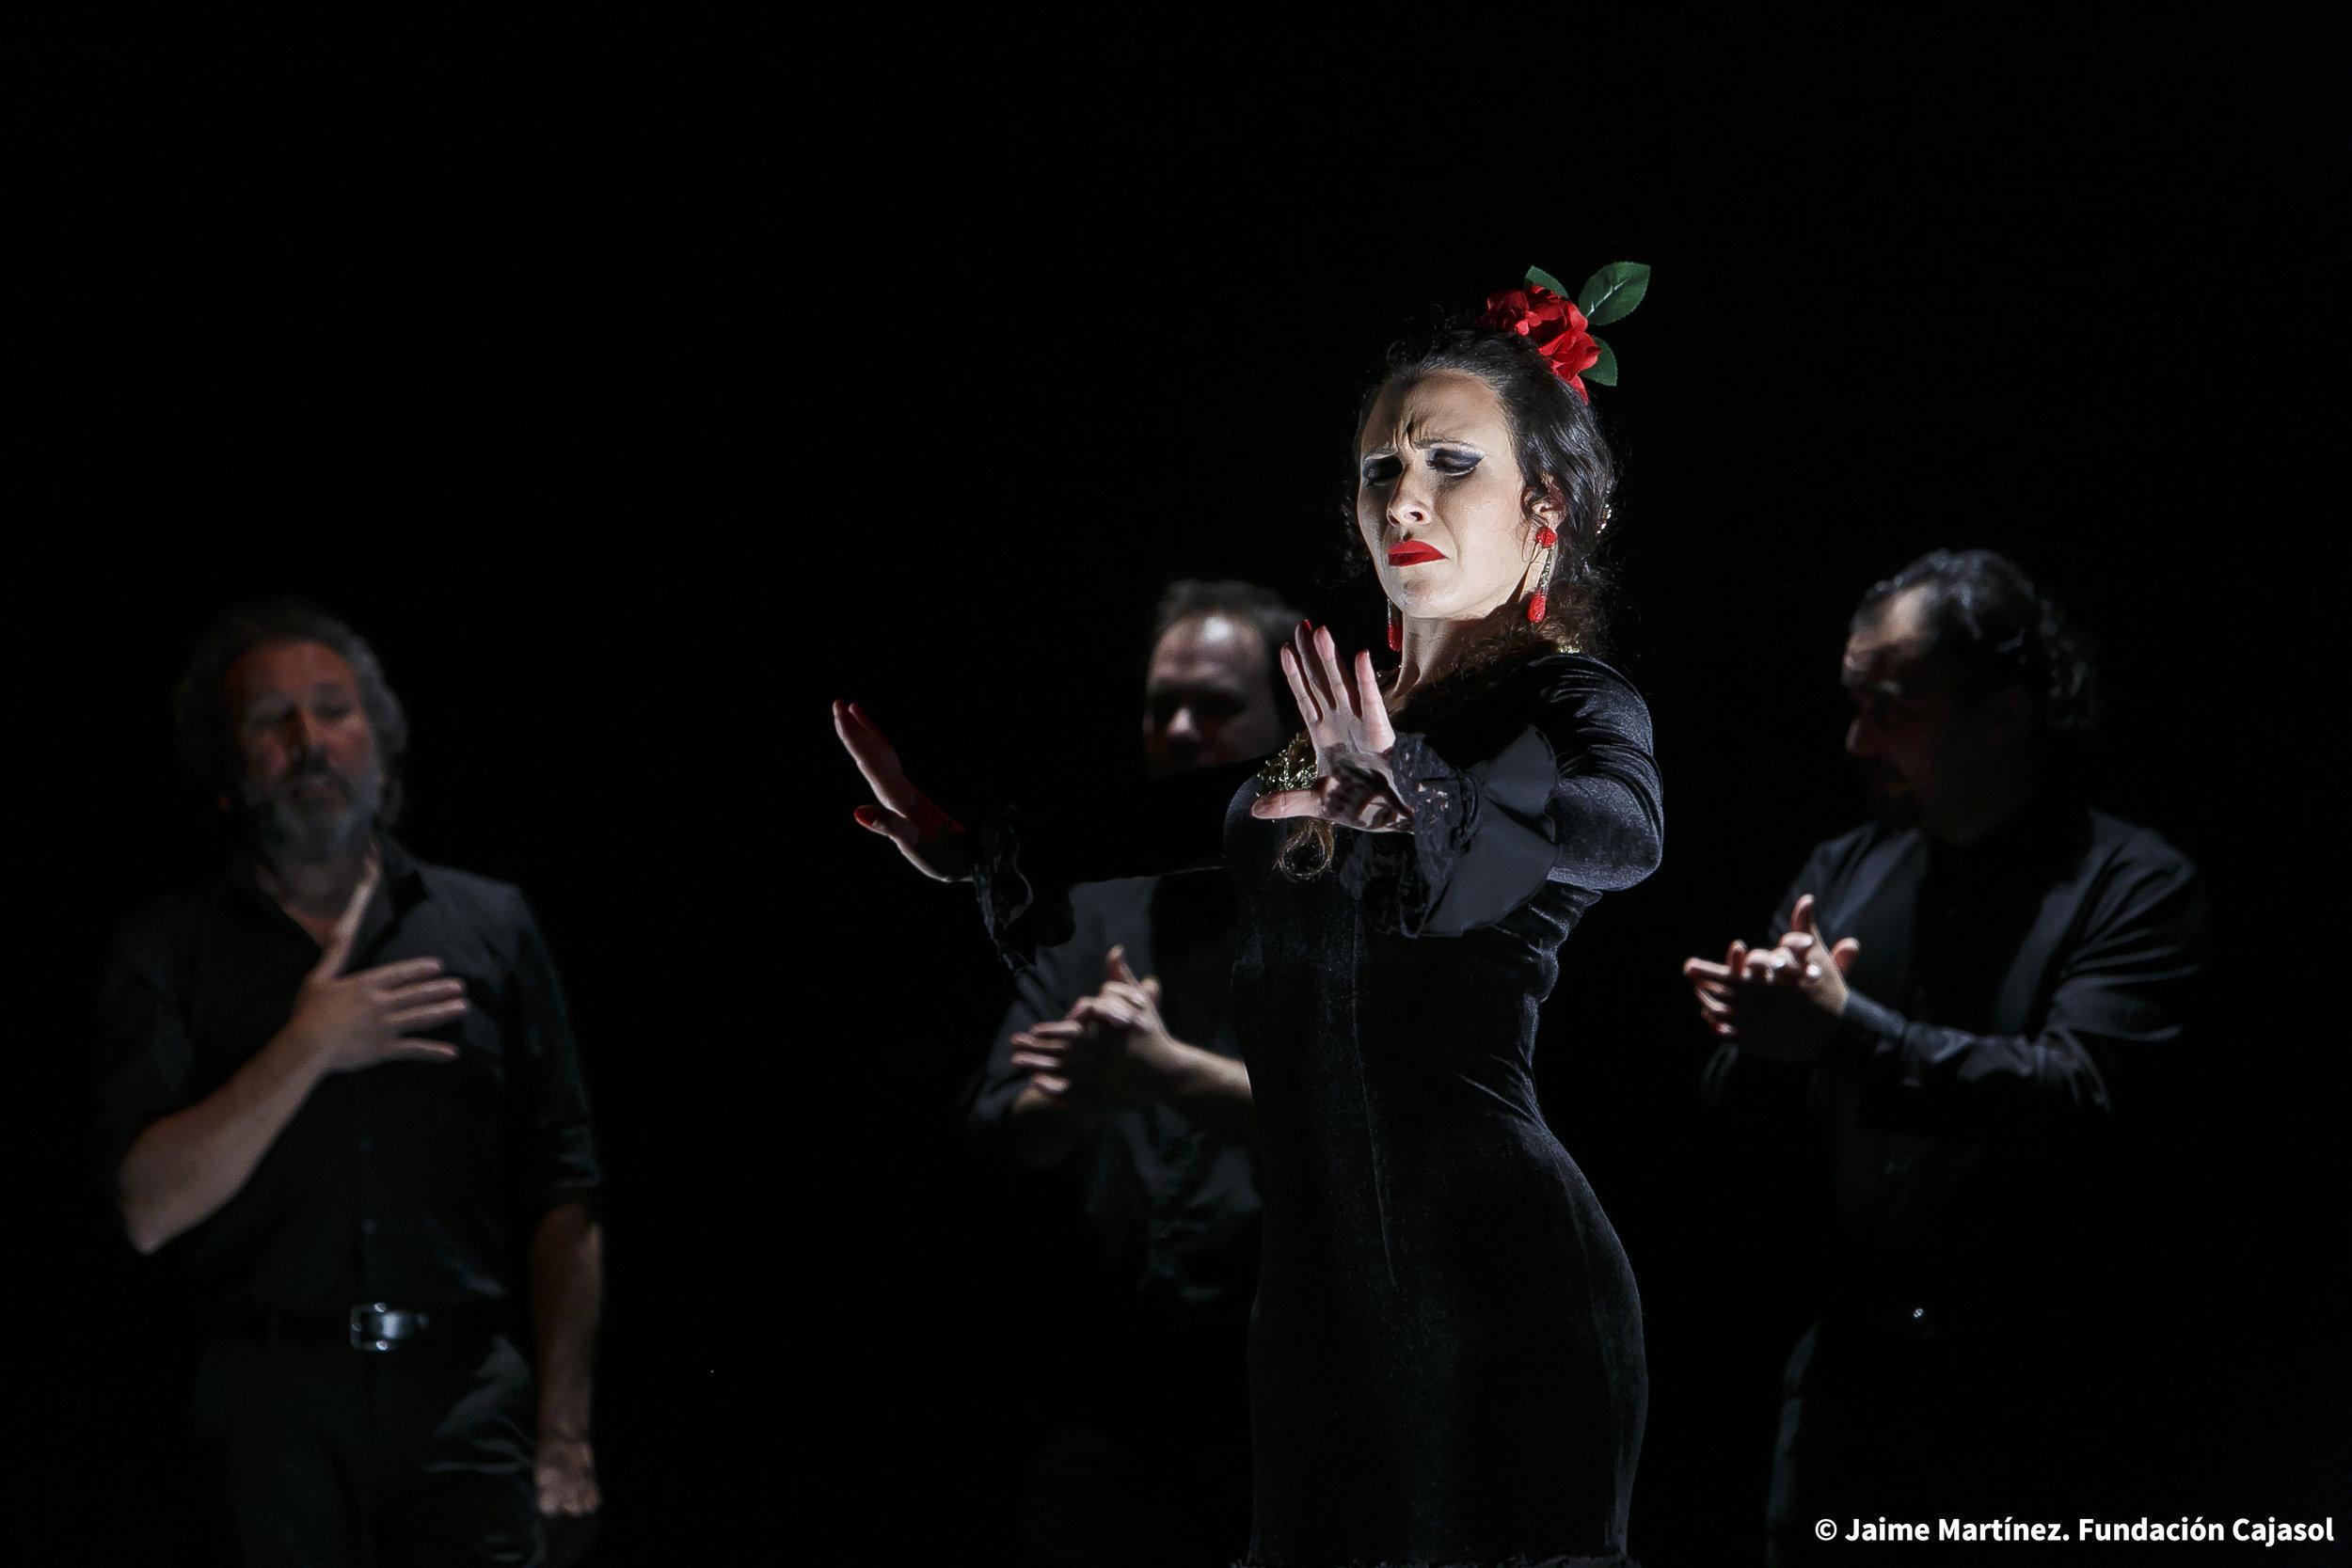 jueves-flamencos-jairo-barrull-24_25005612012_o.jpg